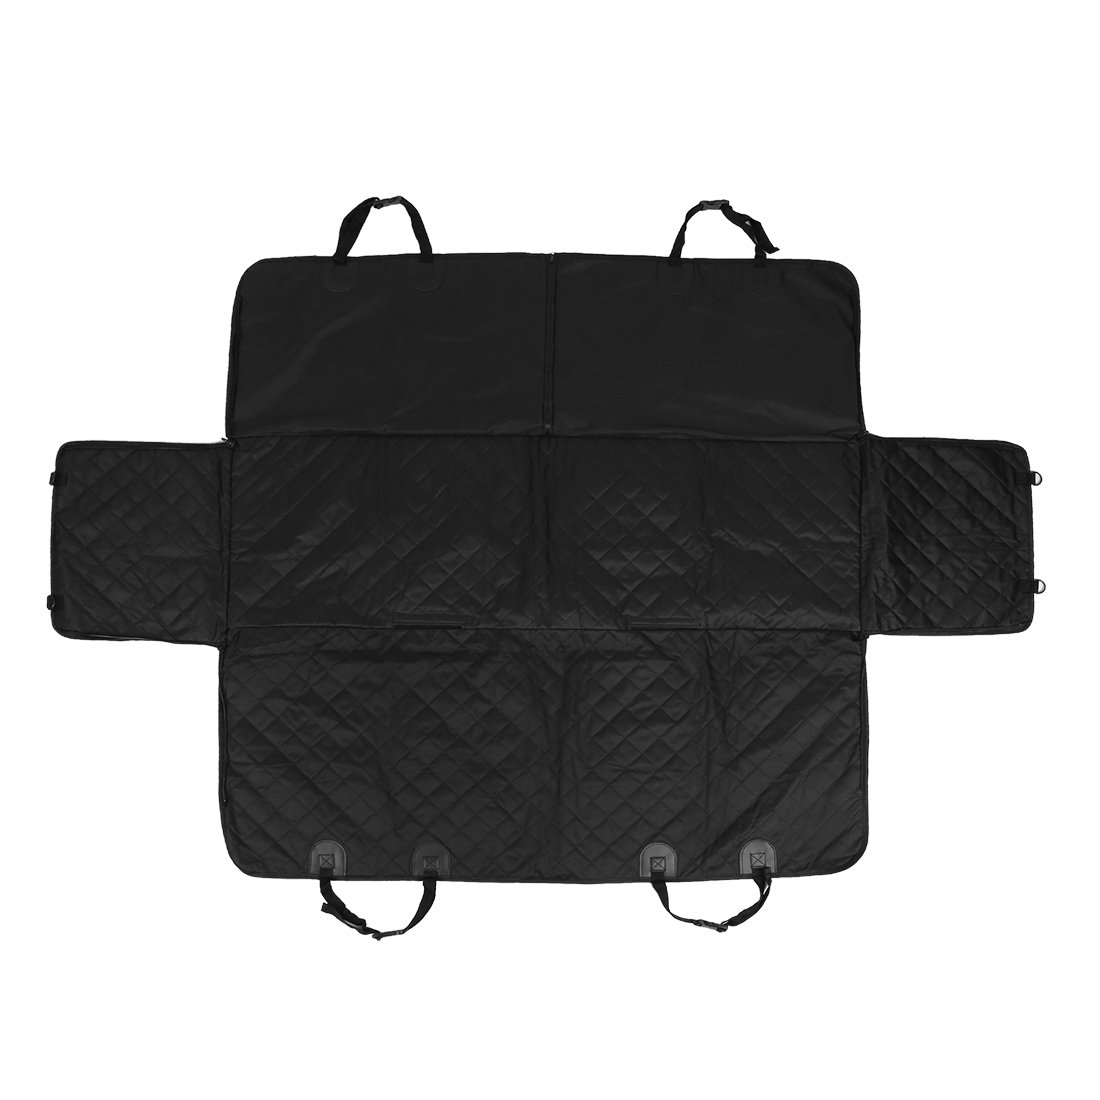 Dog Back Seat Cover Black Pet Waterproof Non-slip Protector Hammock for Car